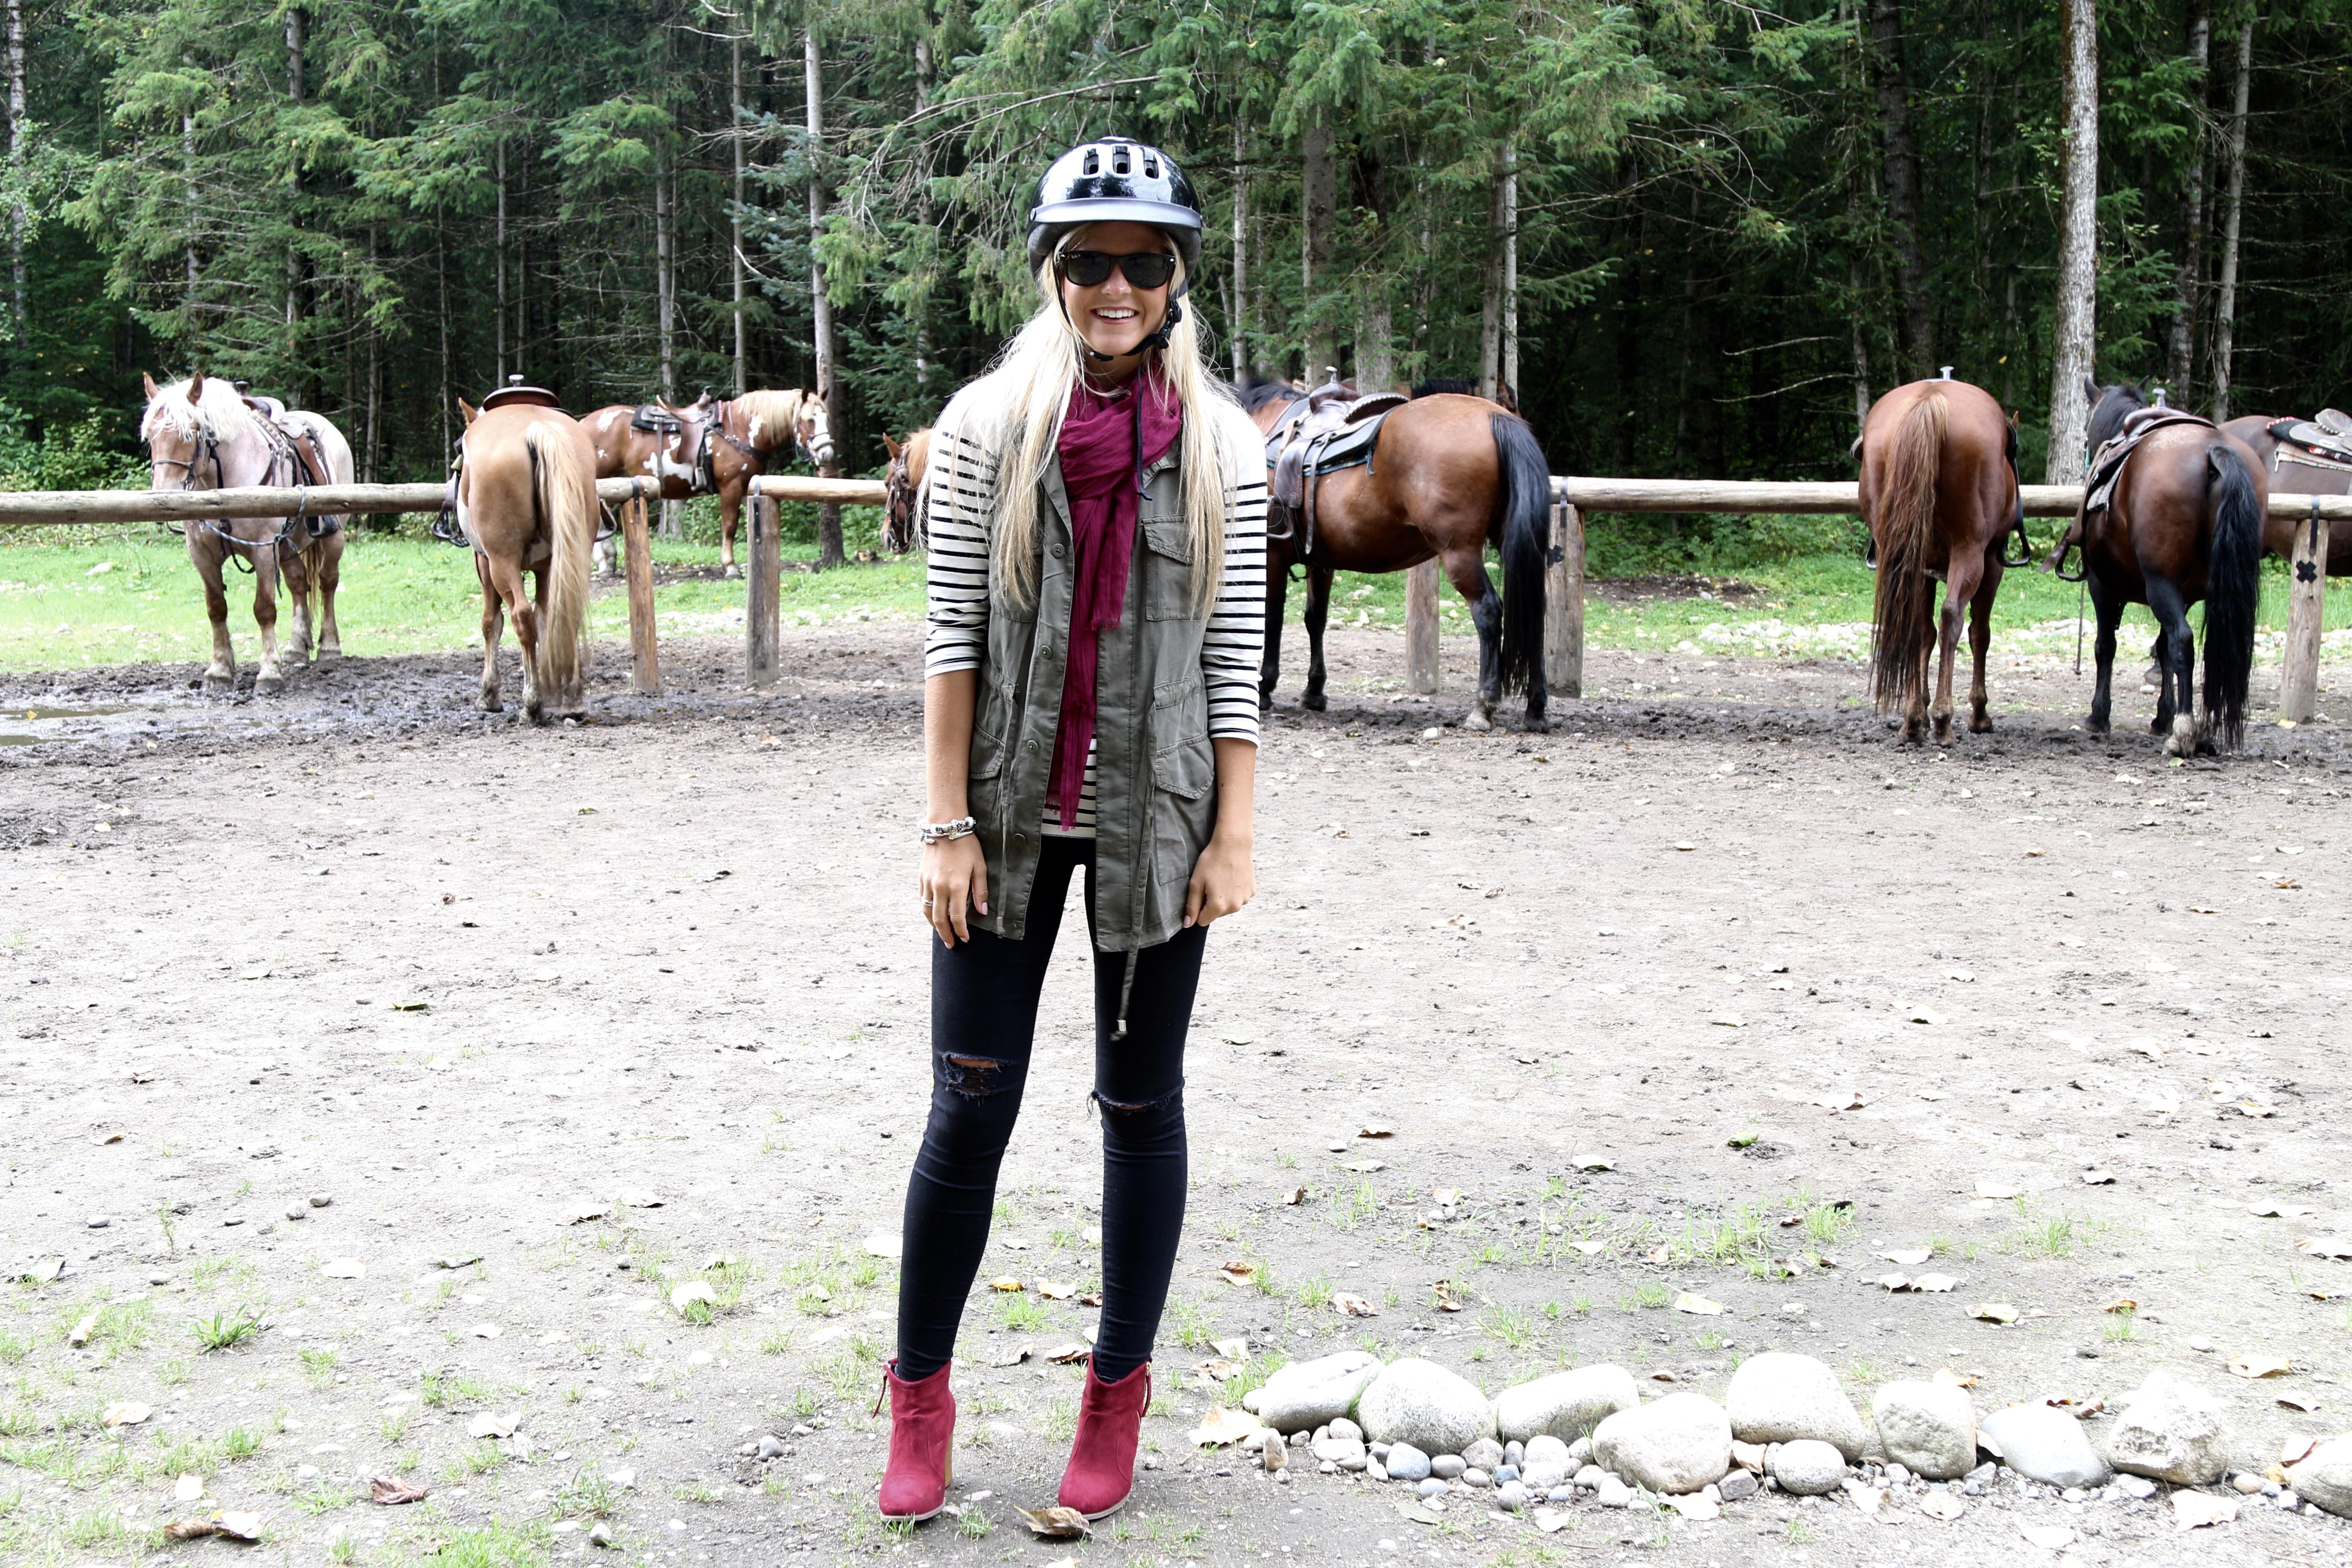 Horseback Riding Outfit